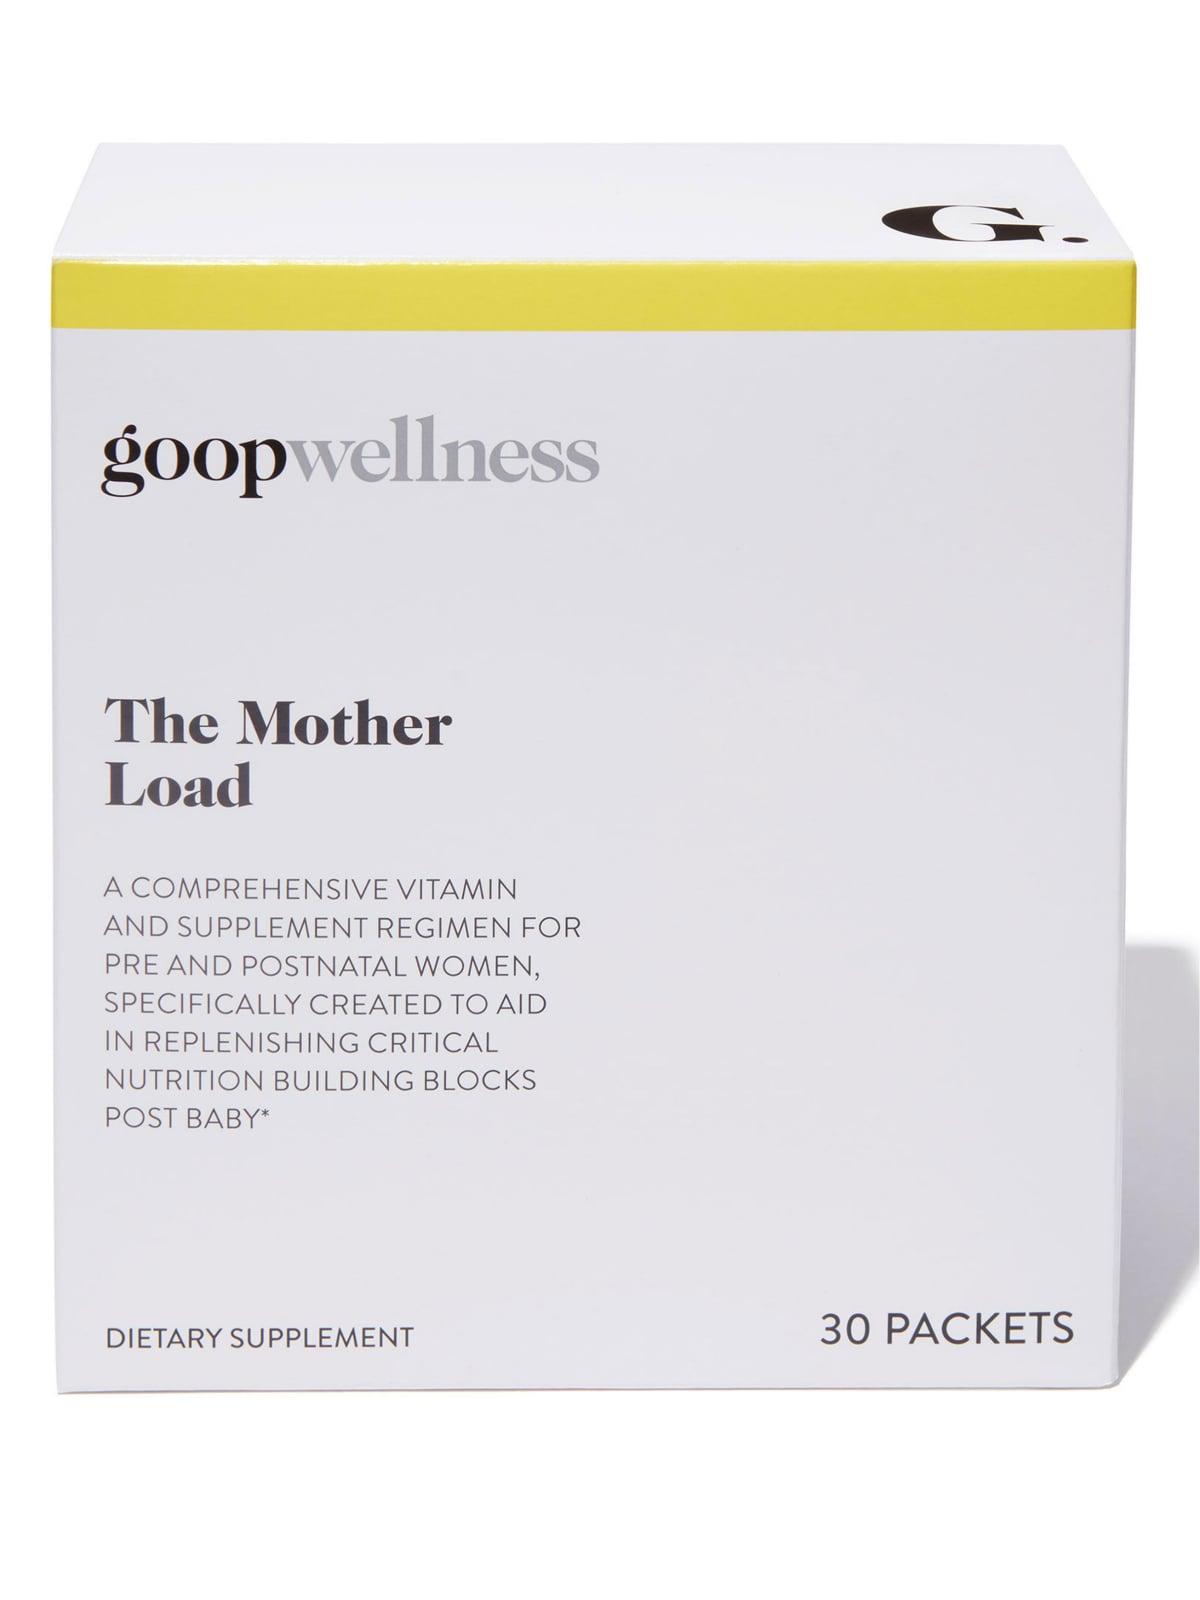 Goop beauty product